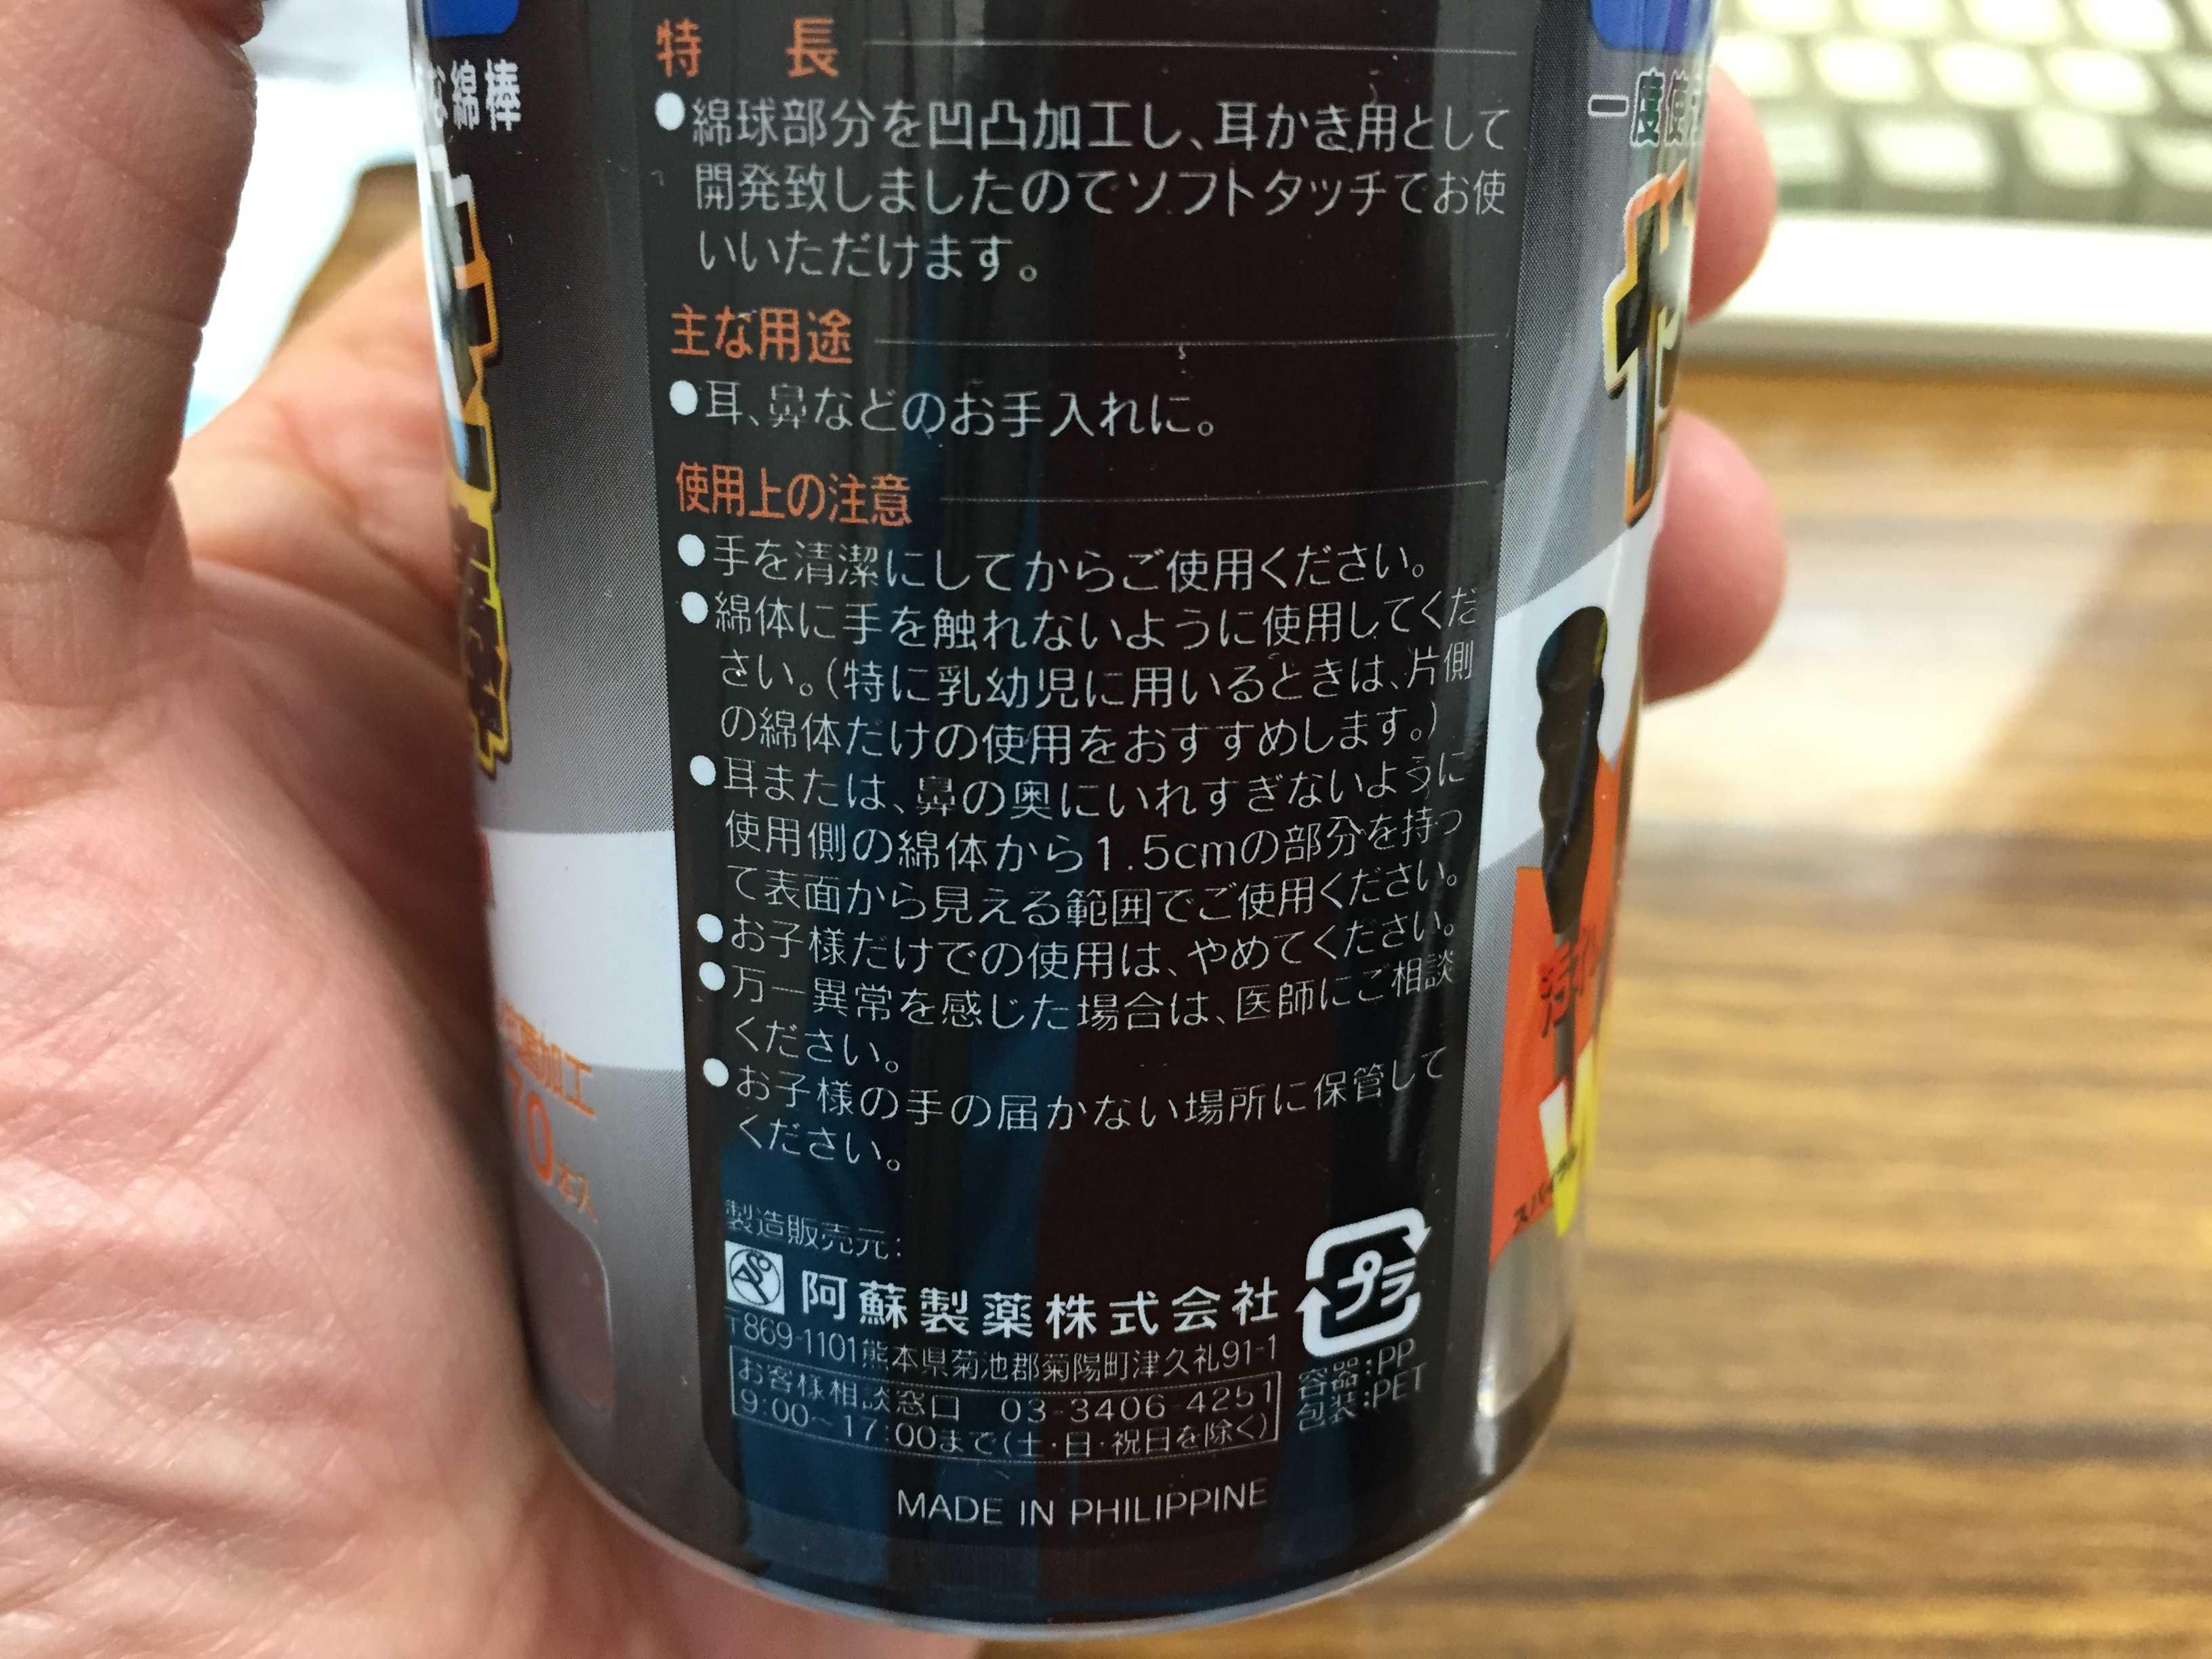 阿蘇製薬株式会社(国内最大手の救急絆創膏メーカー)